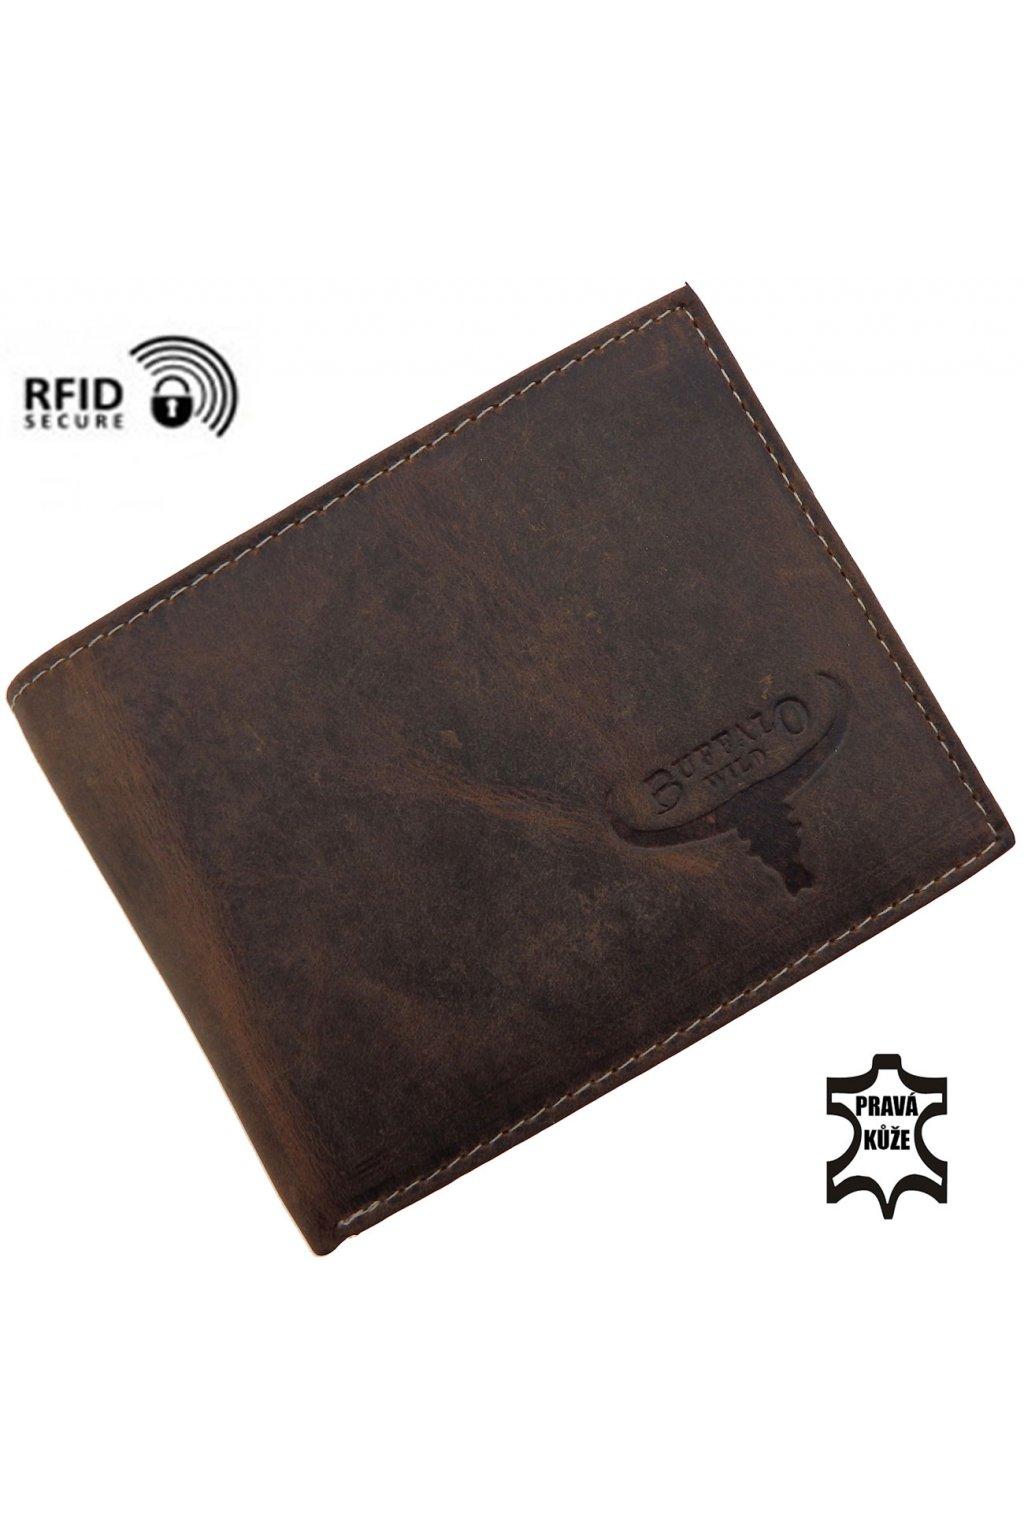 panska kozena penezenka pkp02 rm 05 hbw 7826 h